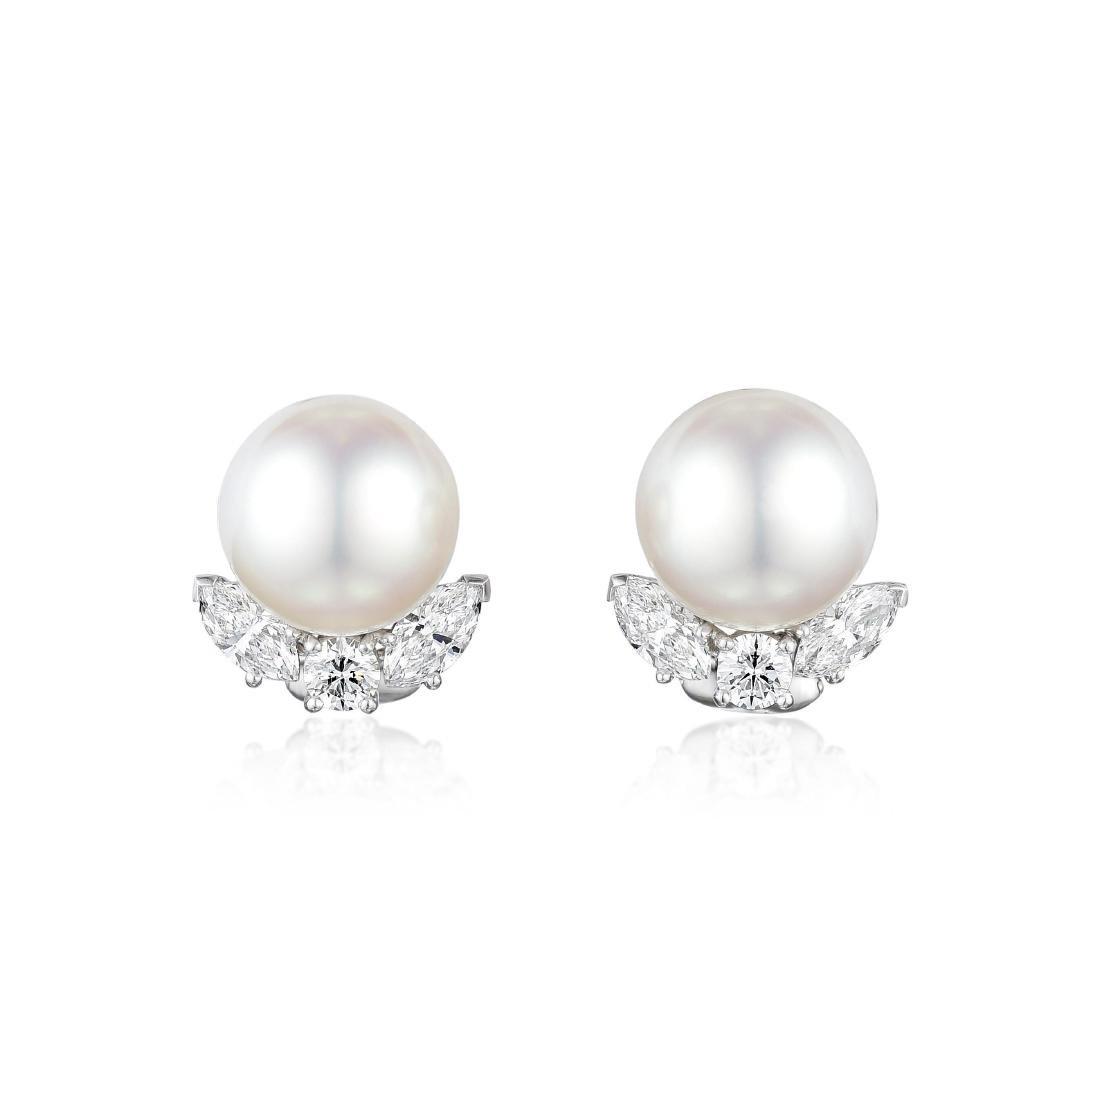 Van Cleef & Arpels South Sea Pearl and Diamond Platinum